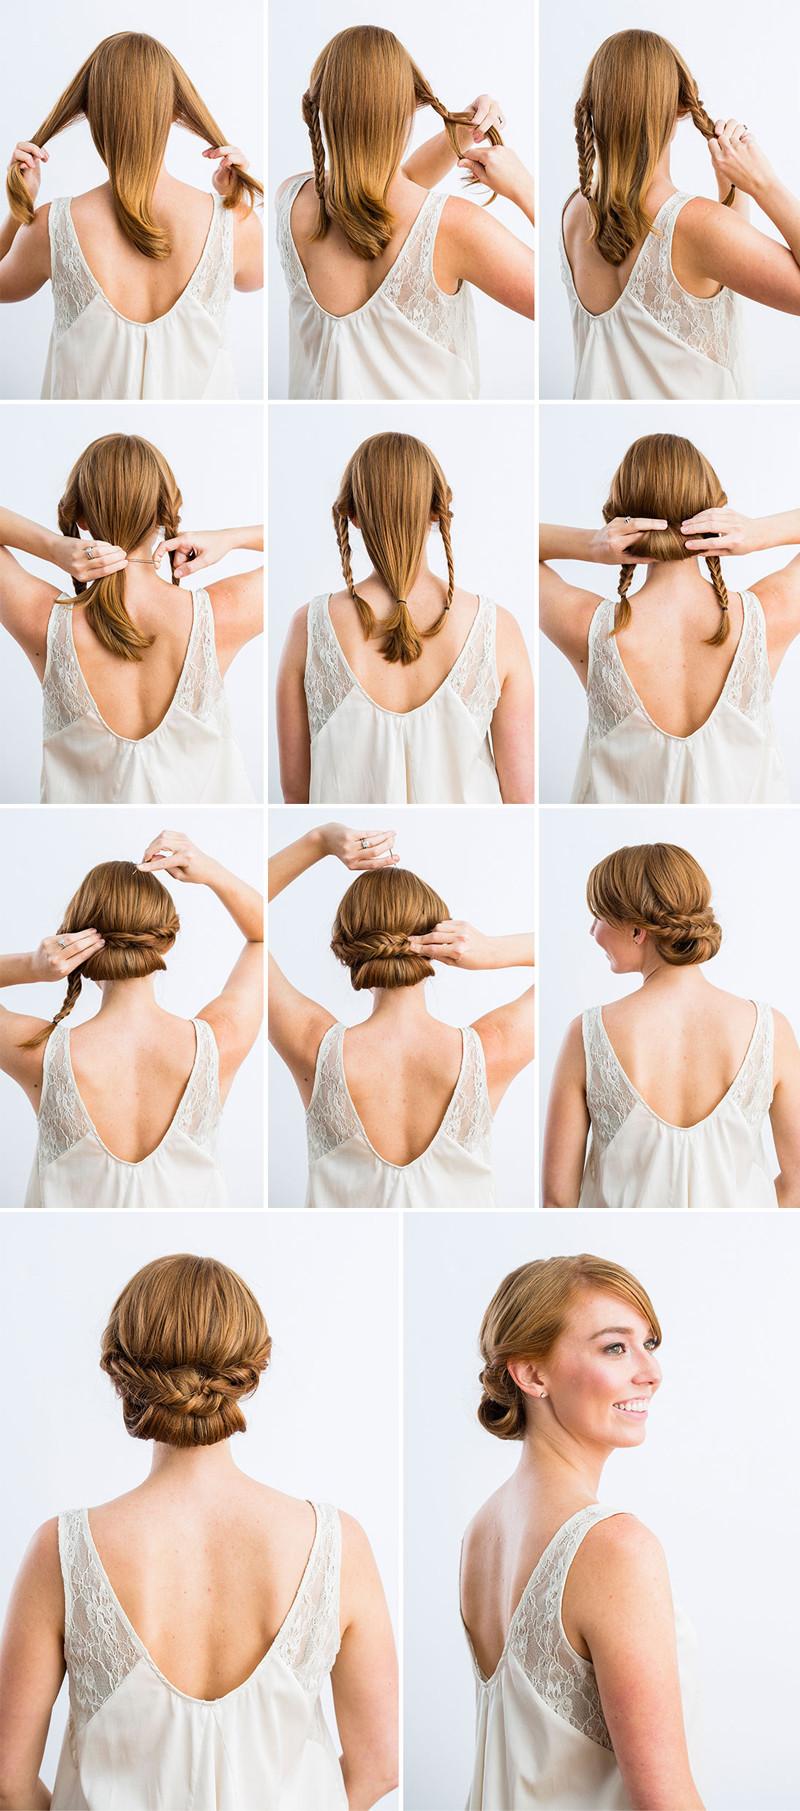 Diy Wedding Hairstyles  10 Best DIY Wedding Hairstyles with Tutorials